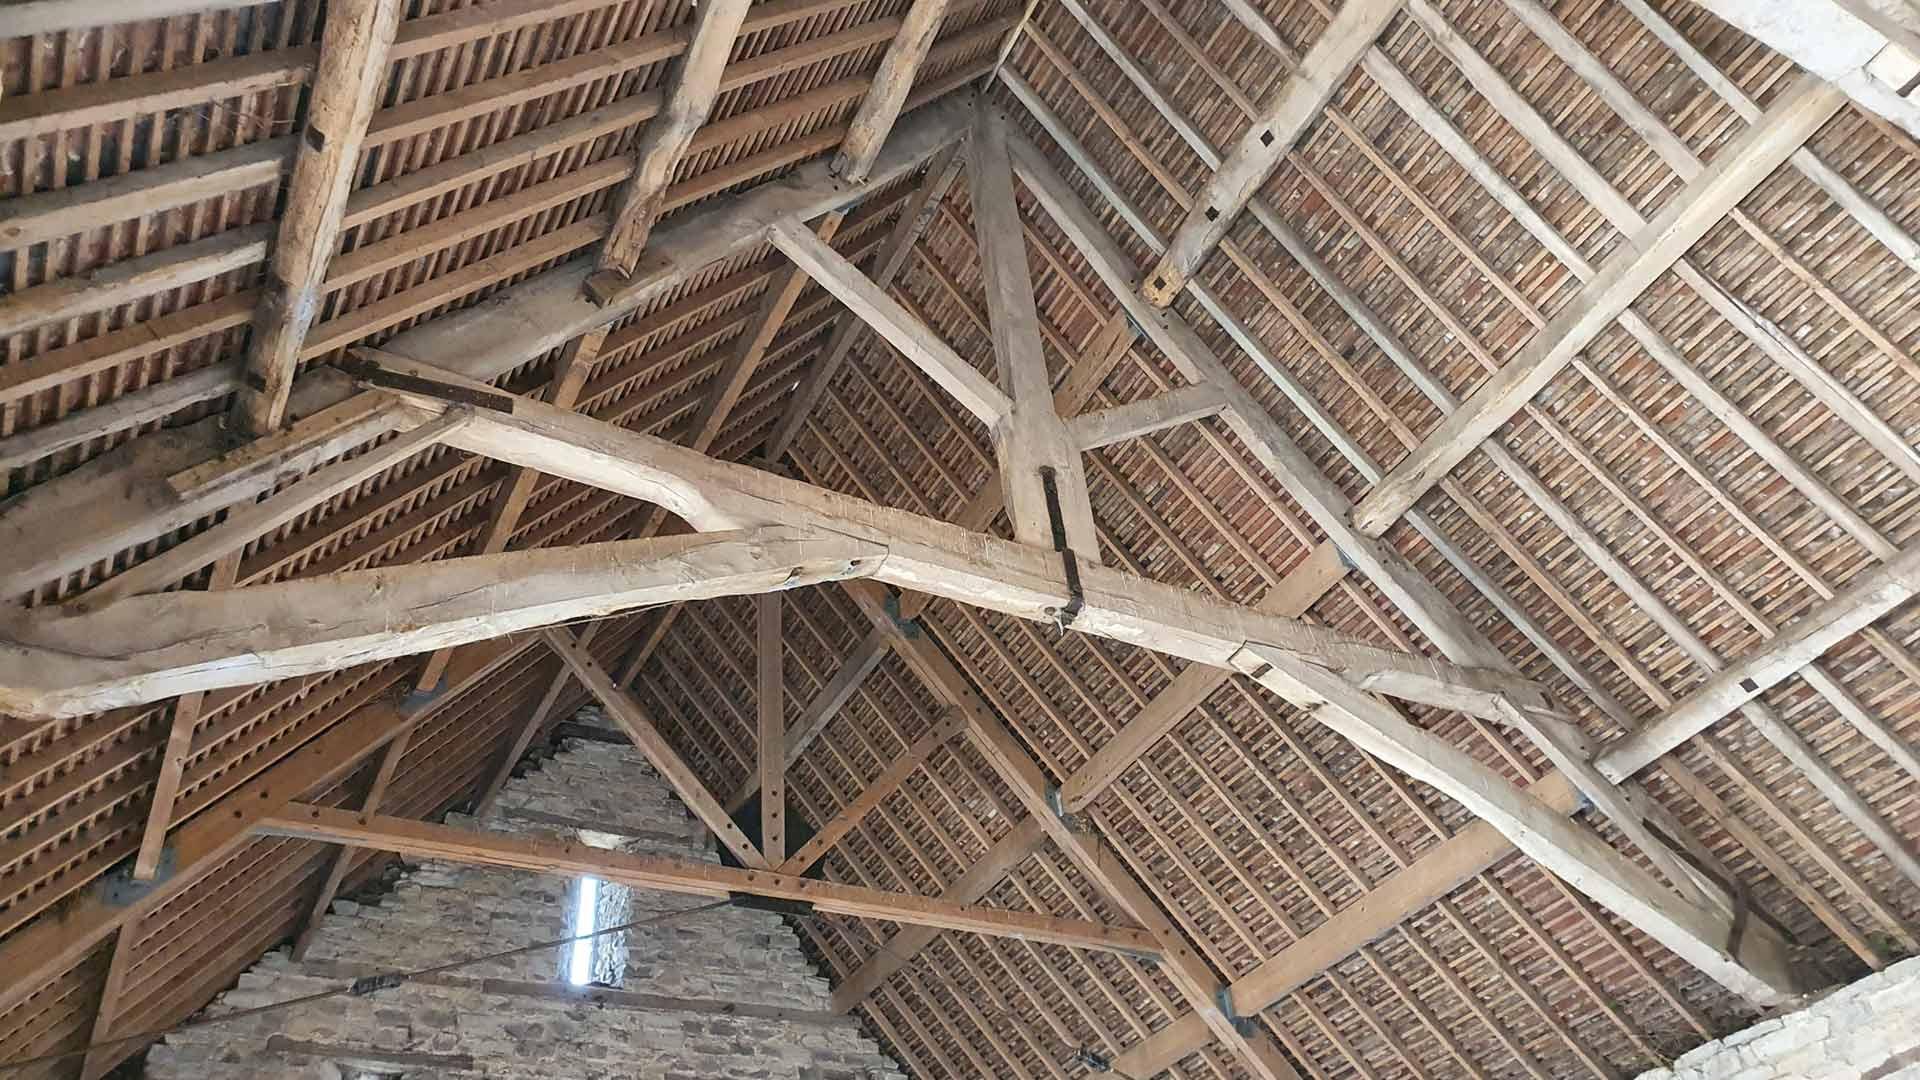 barn internal structure